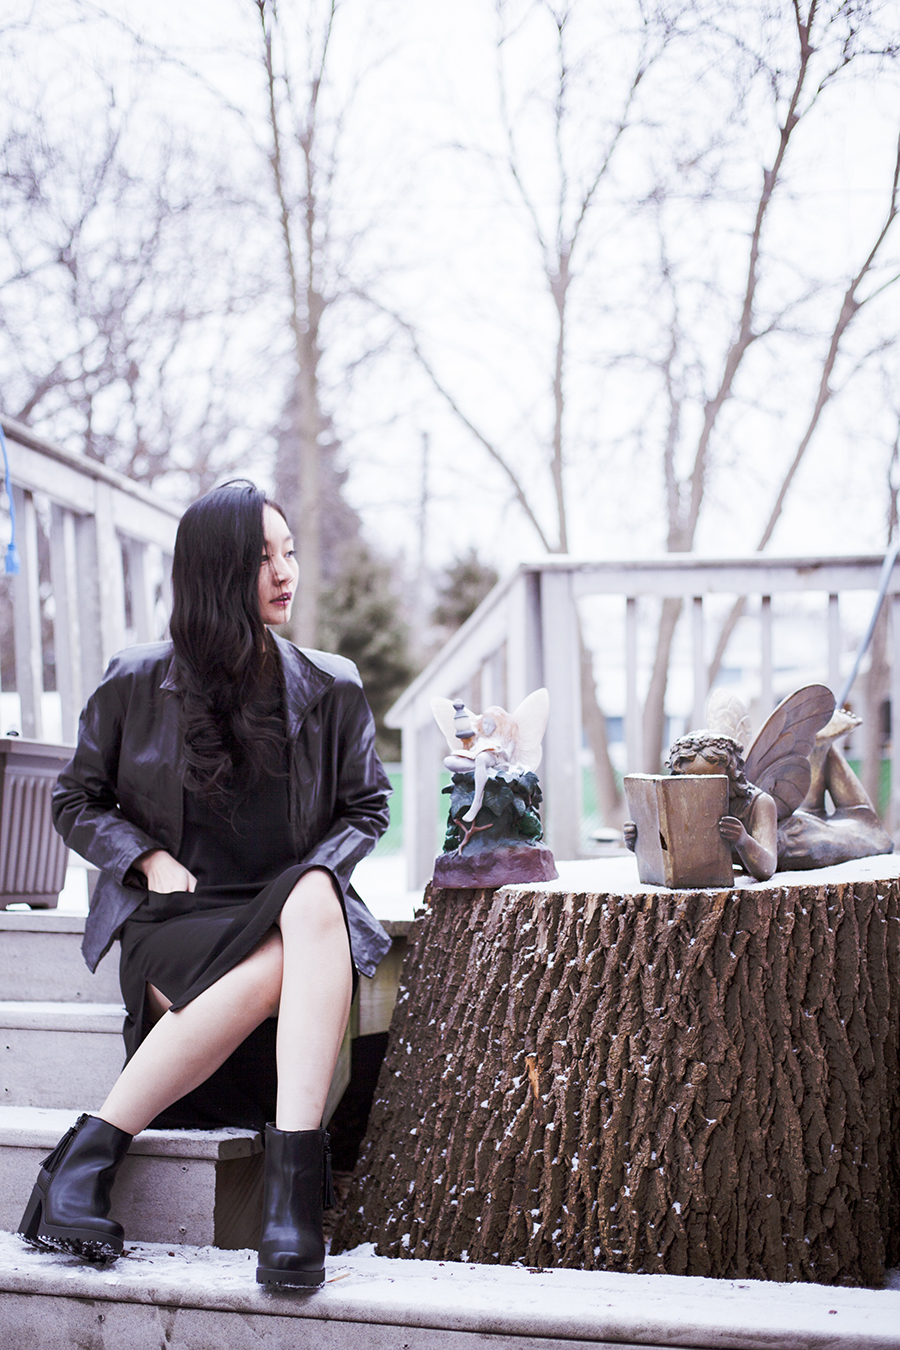 Monochrome winter outfit: P.Rossa black leather jacket, Forever 21 black dress, DealSale amethyst necklace, Uniqlo Heattech top, Steve Madden black tassel heel boots.